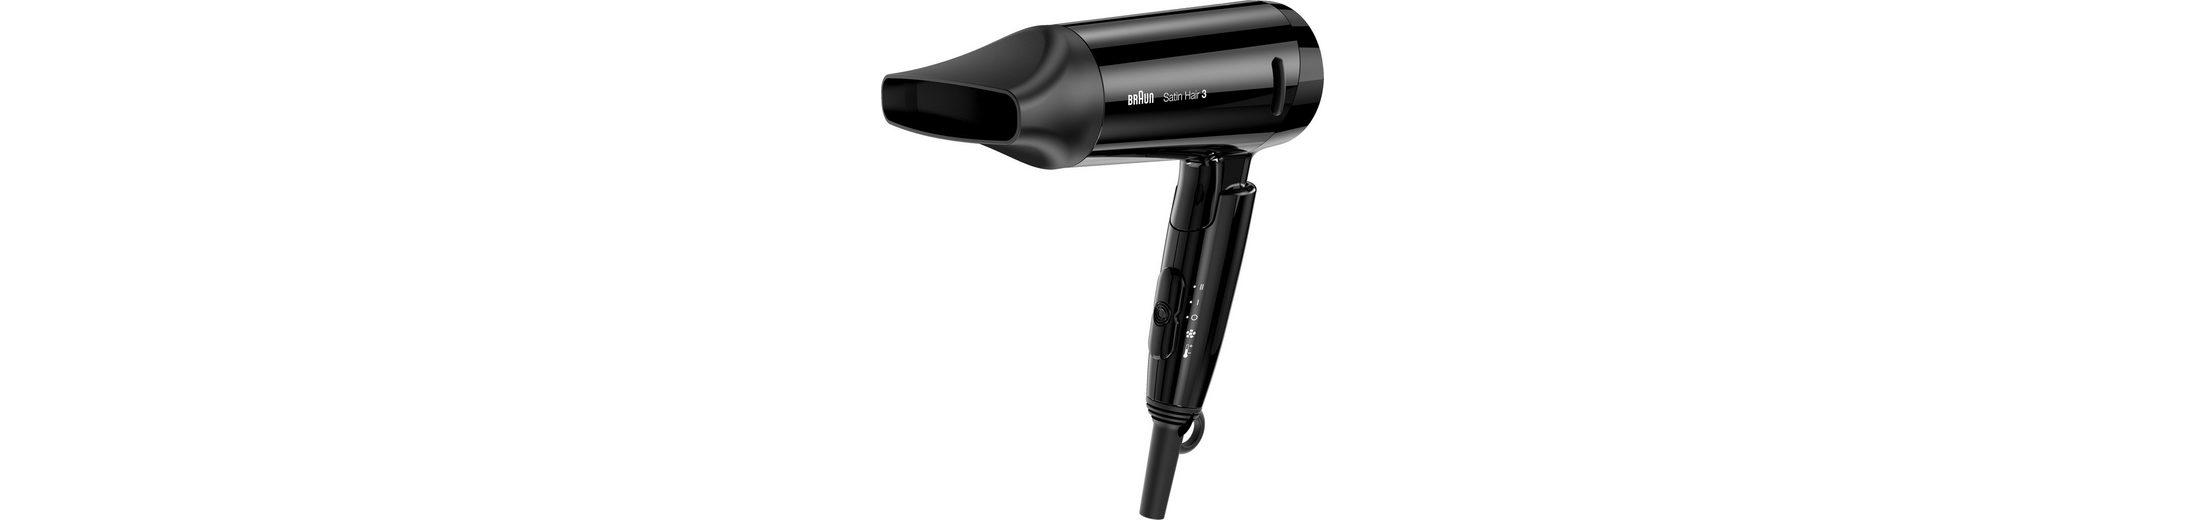 Braun, Haartrockner, Satin Hair 3 HD 350 Style&Go, 1600 Watt